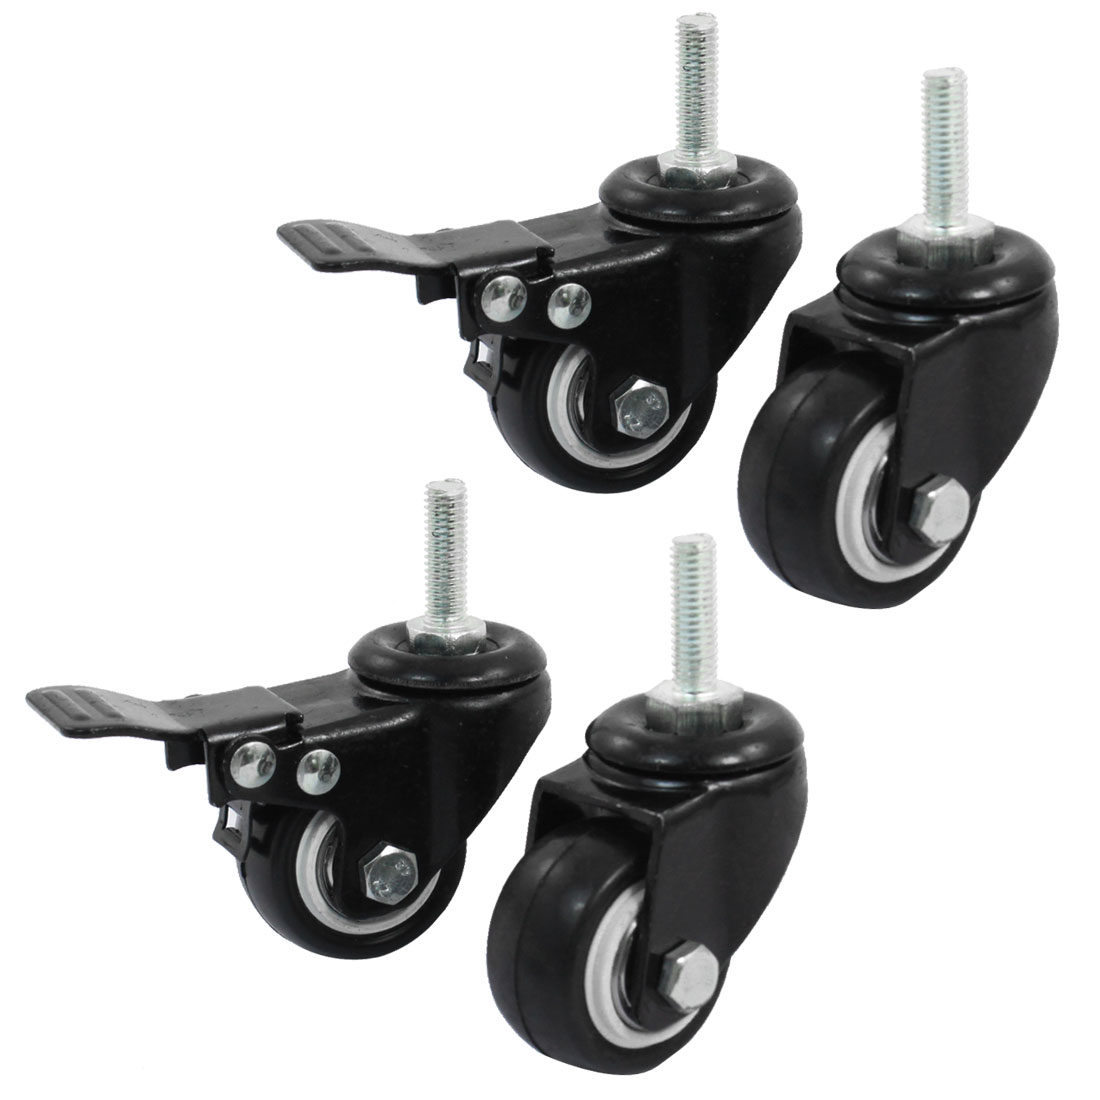 UXCELL 8Mm Thread 1.5 Wheel Rotatable Shopping Trolley Brake Swivel Caster Black 4Pcs